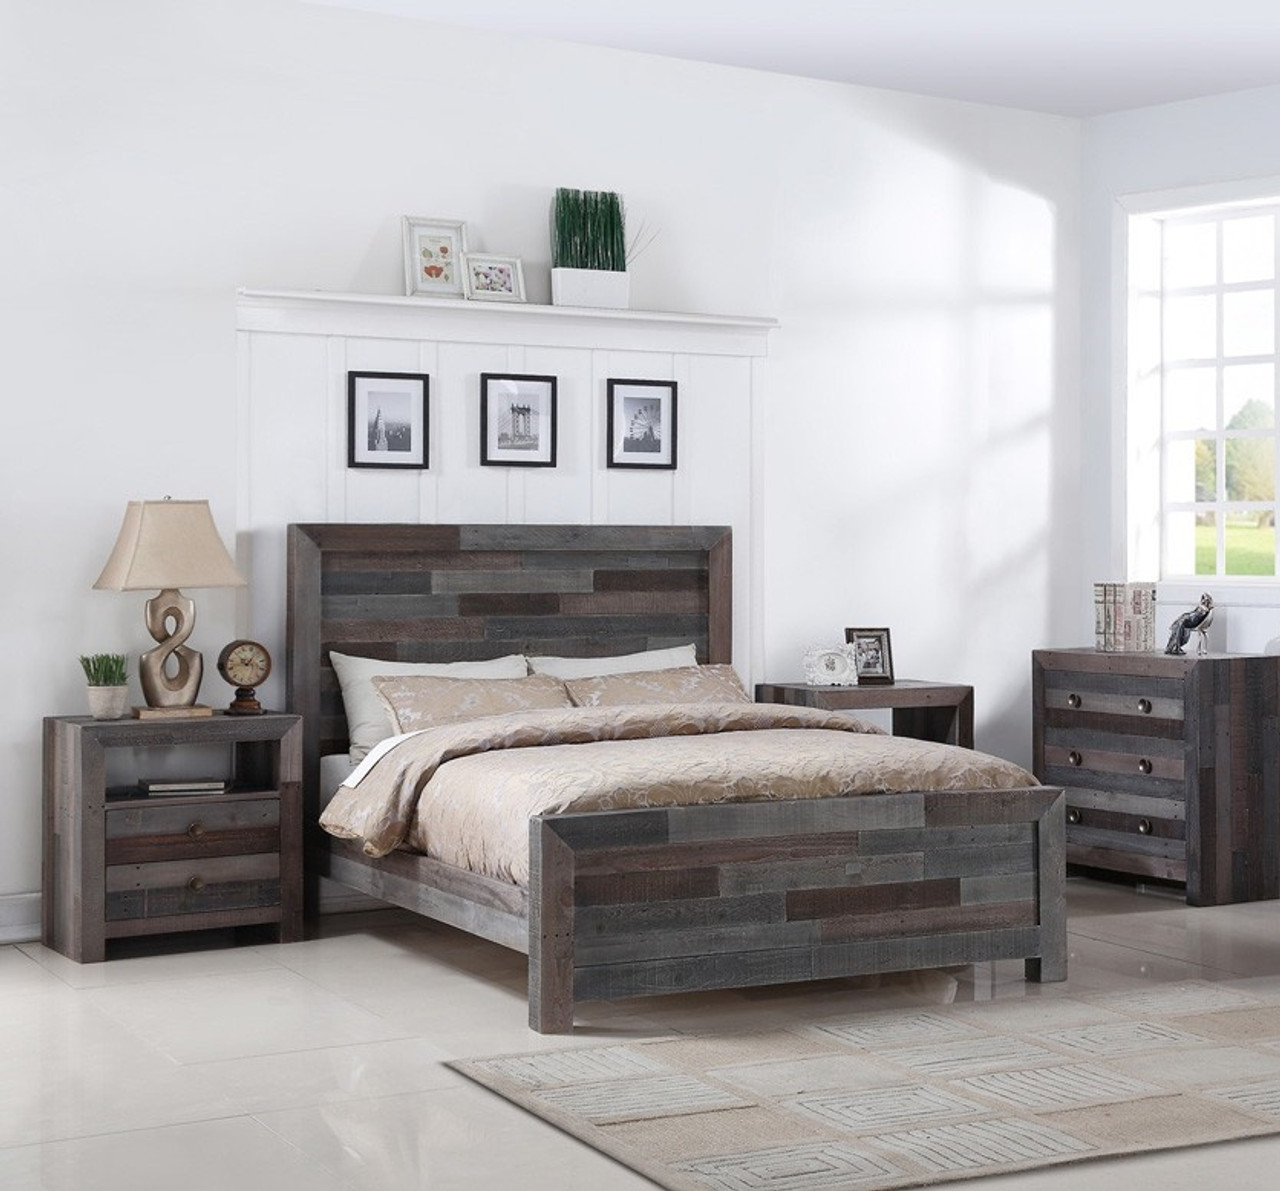 Angora Reclaimed Wood California King Platform Bed   Zin Home